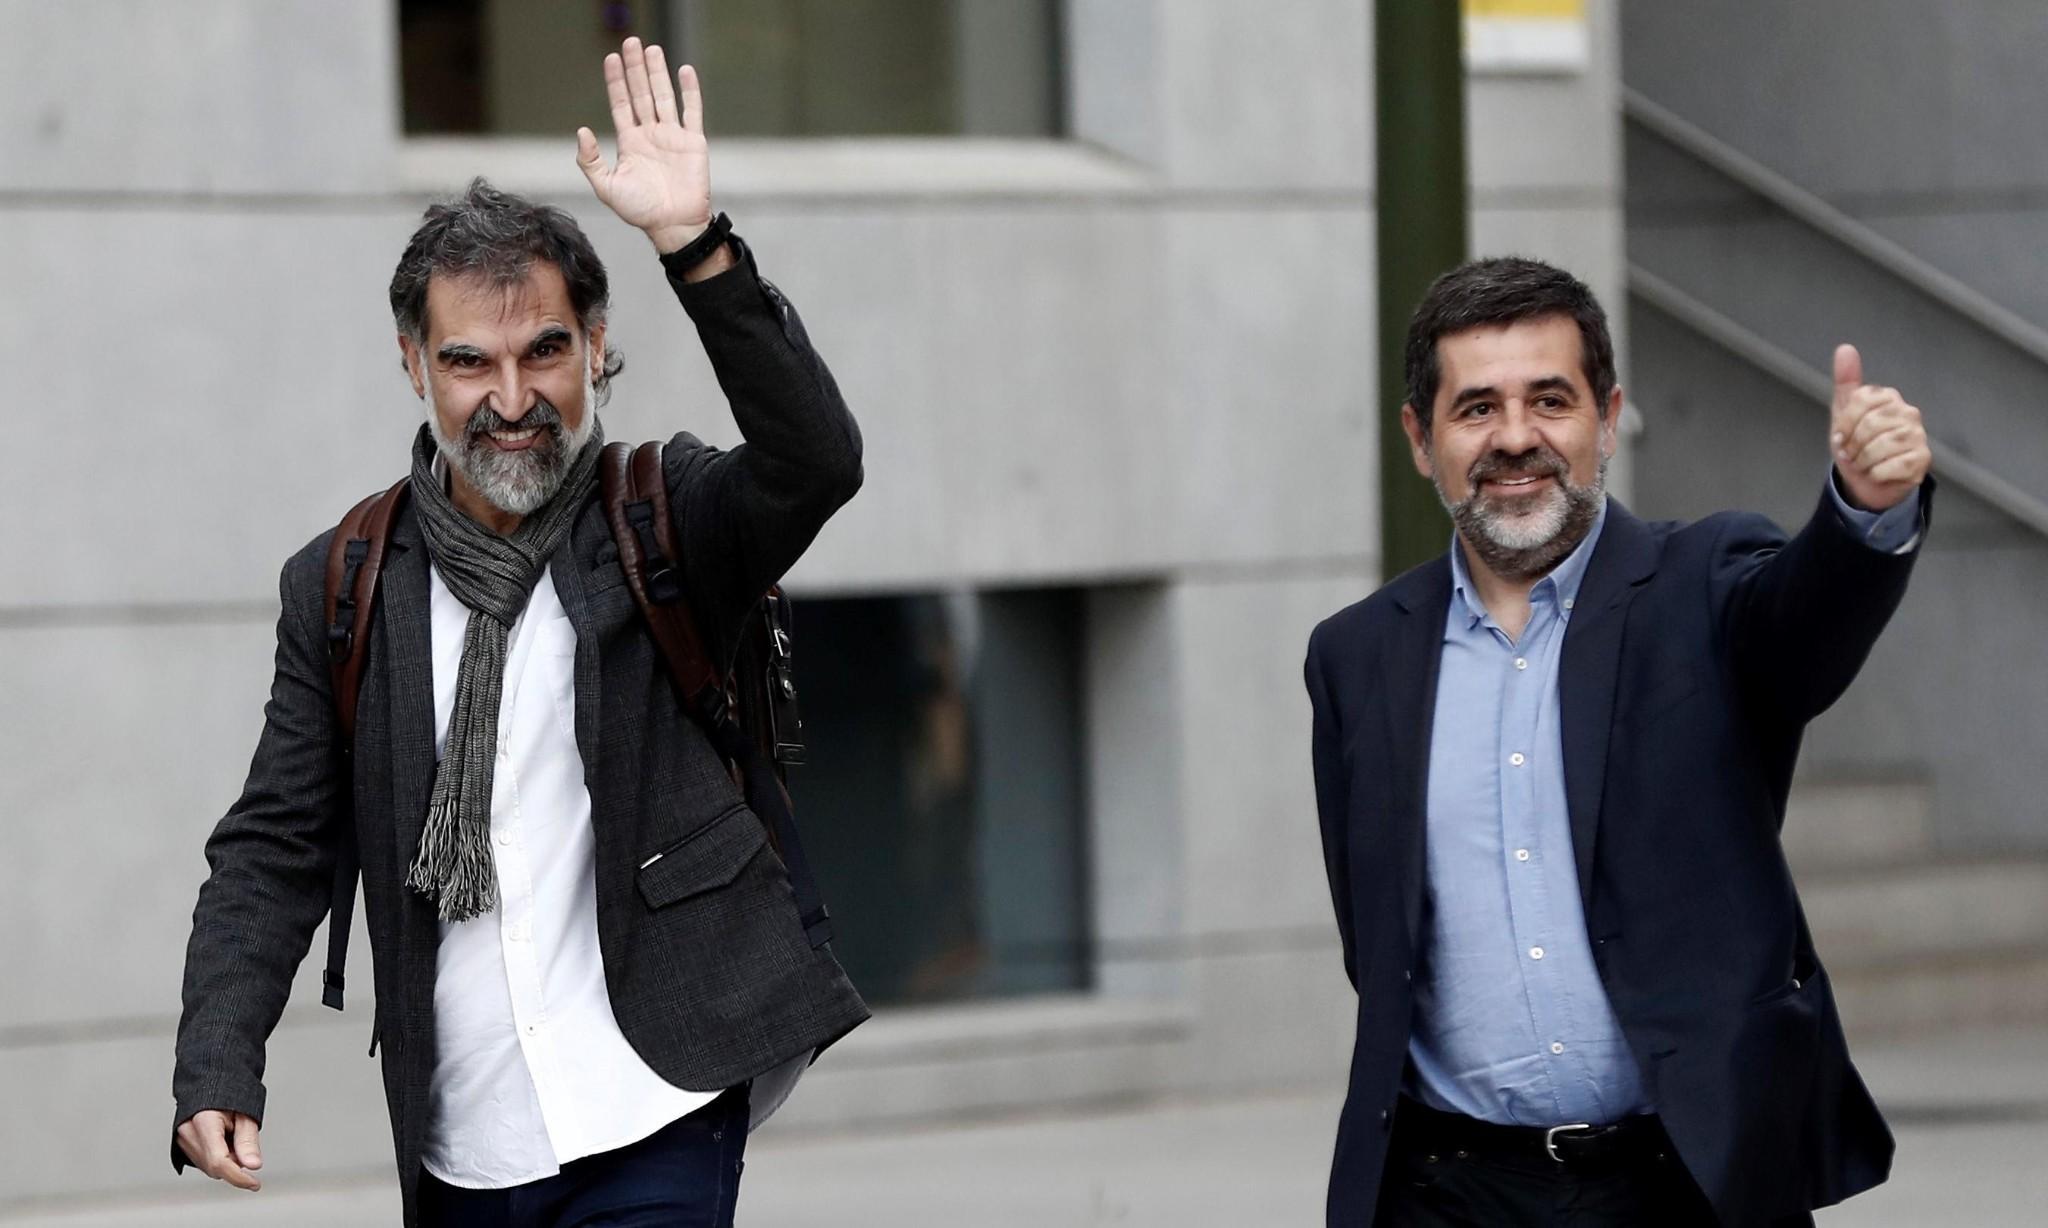 Madrid jails Catalan separatist leaders pending investigation